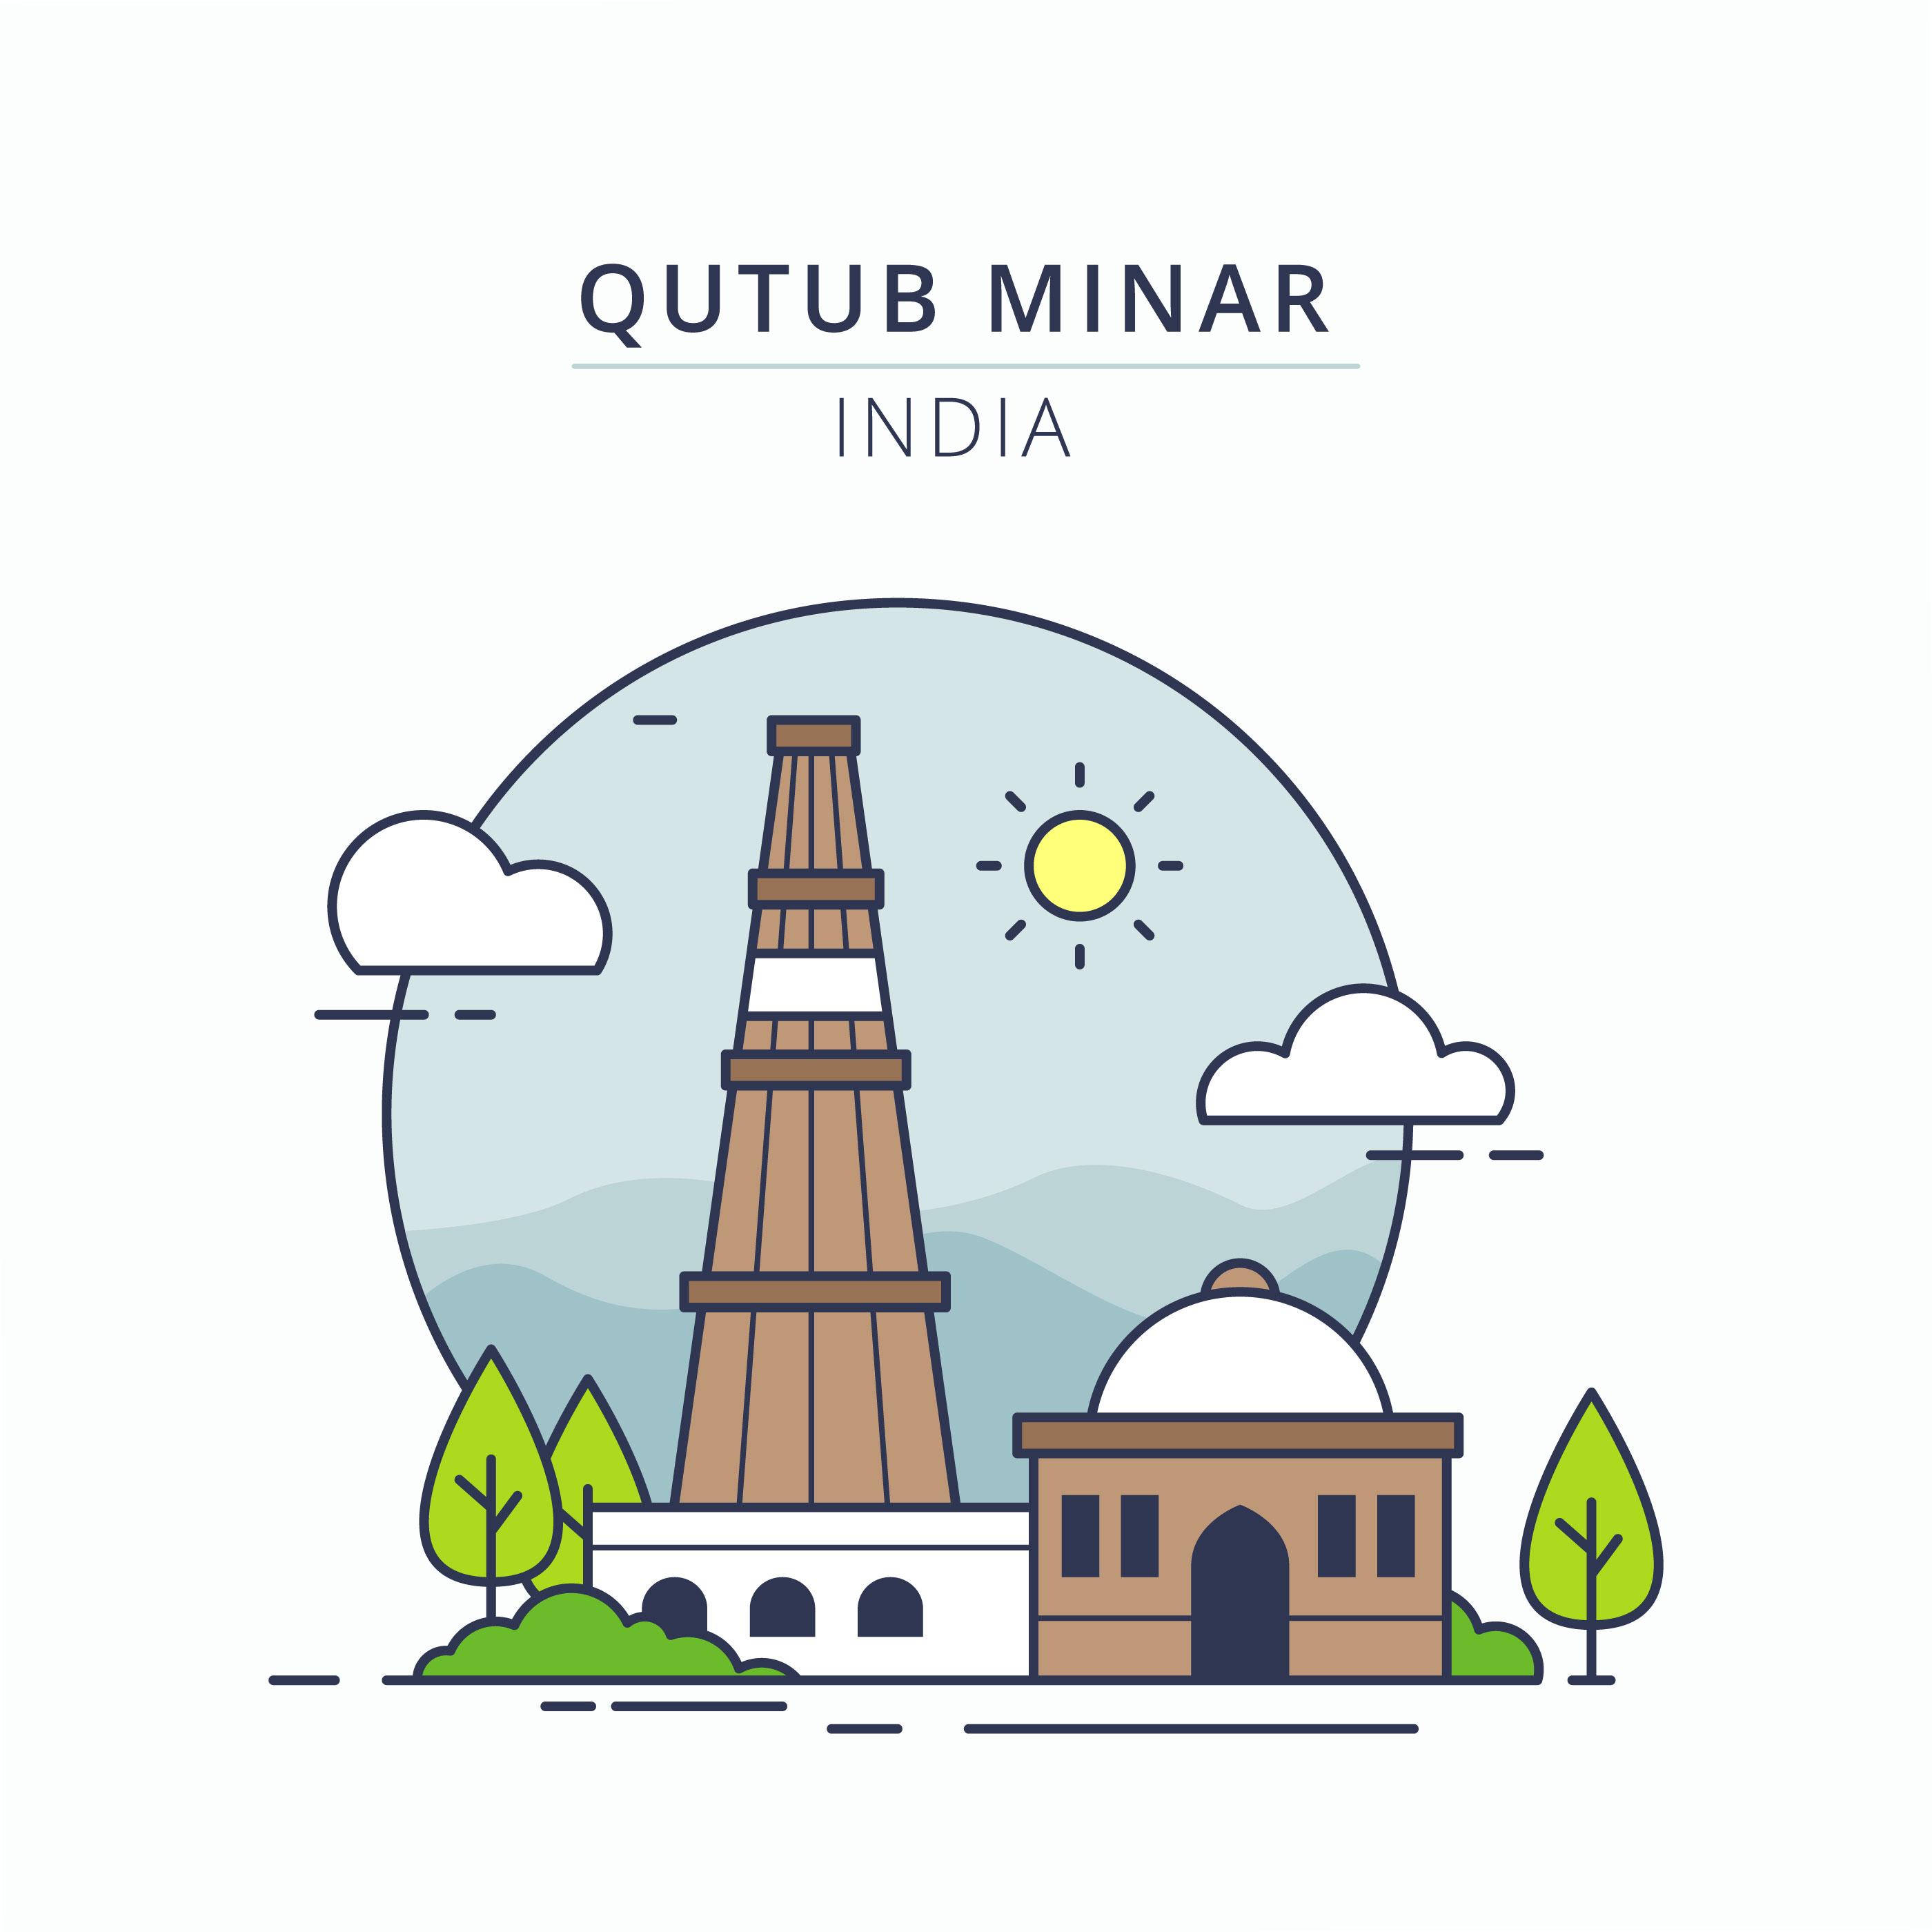 Line Drawing Of Qutub Minar : Qutub minar illustration download free vector art stock